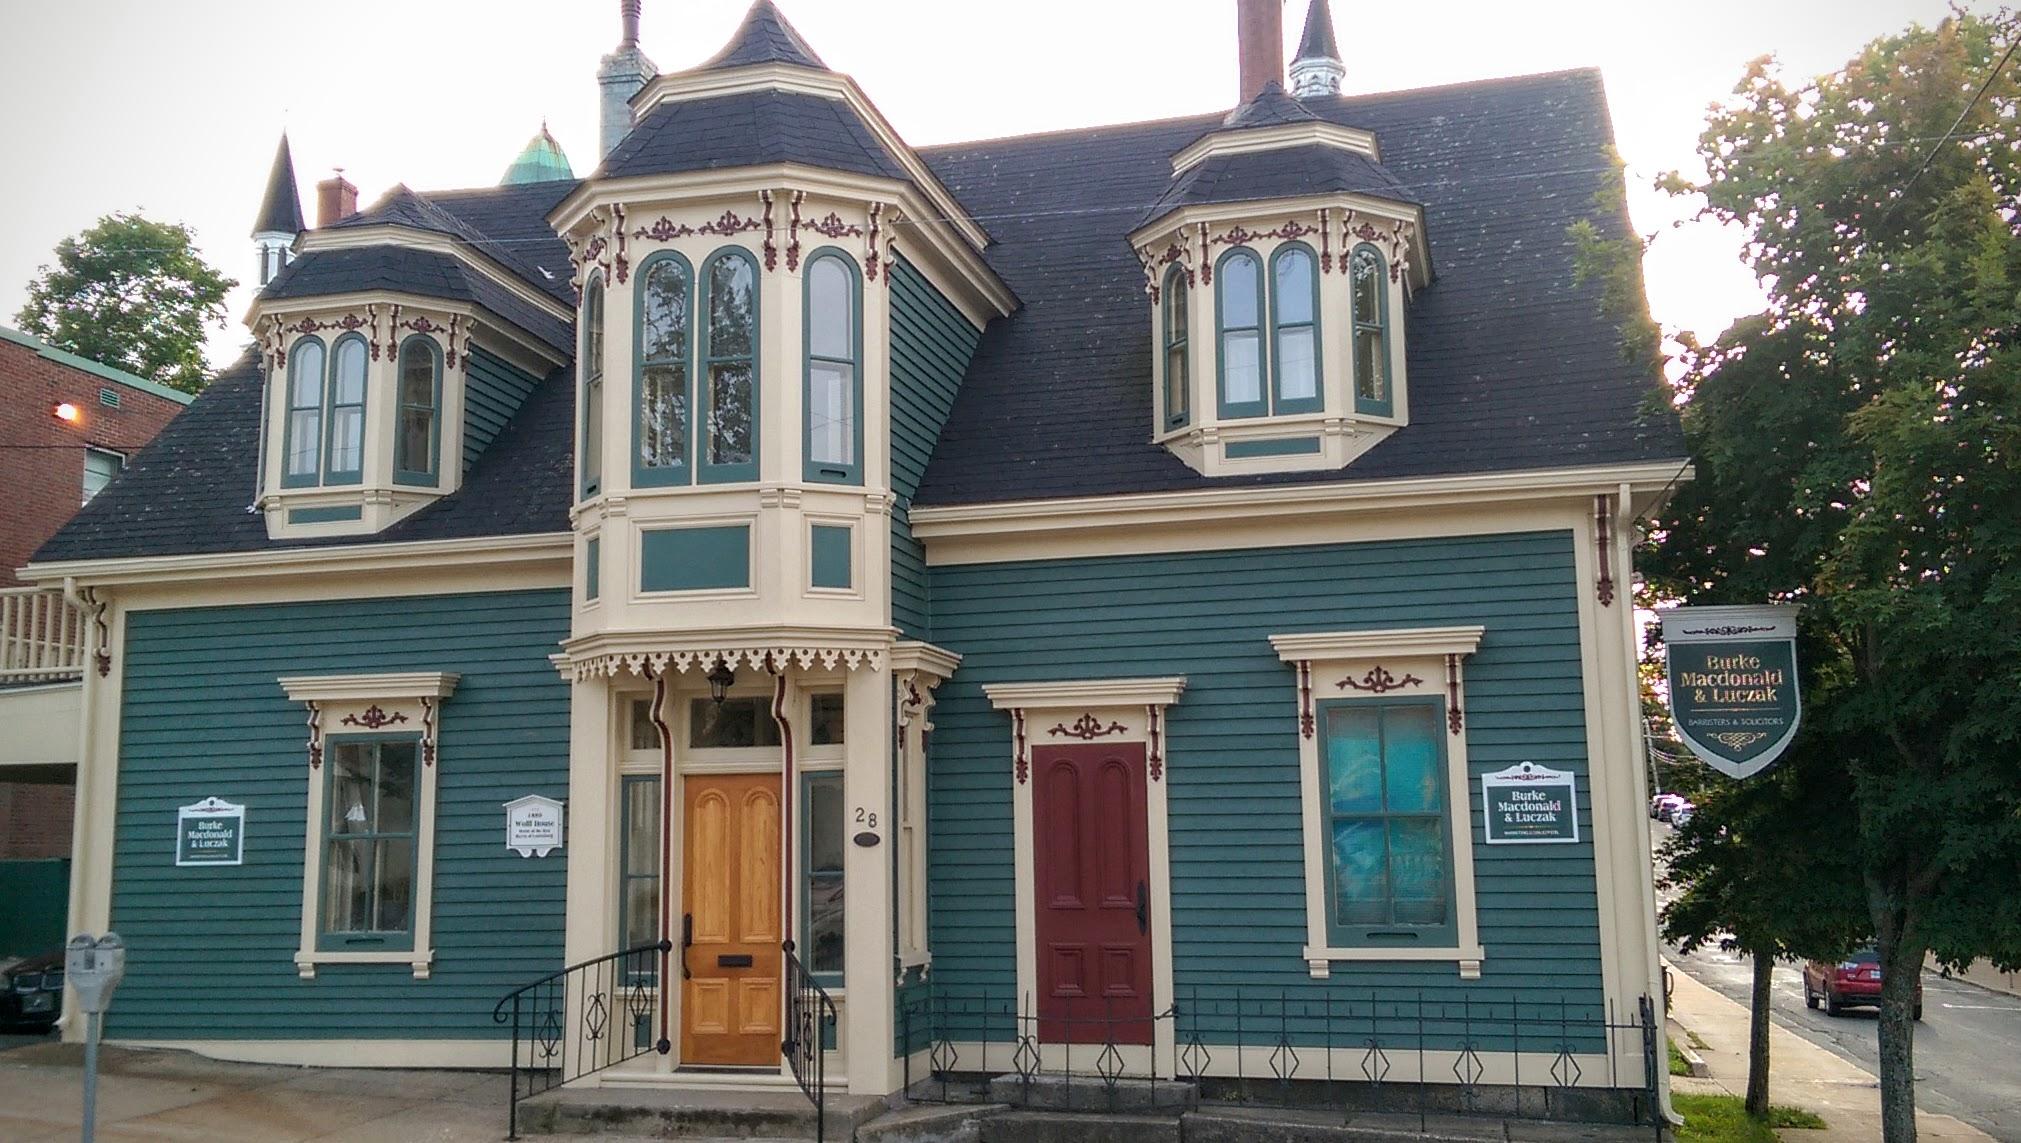 Wolff_House,_Lunenburg,_Nova_Scotia_01.jpg